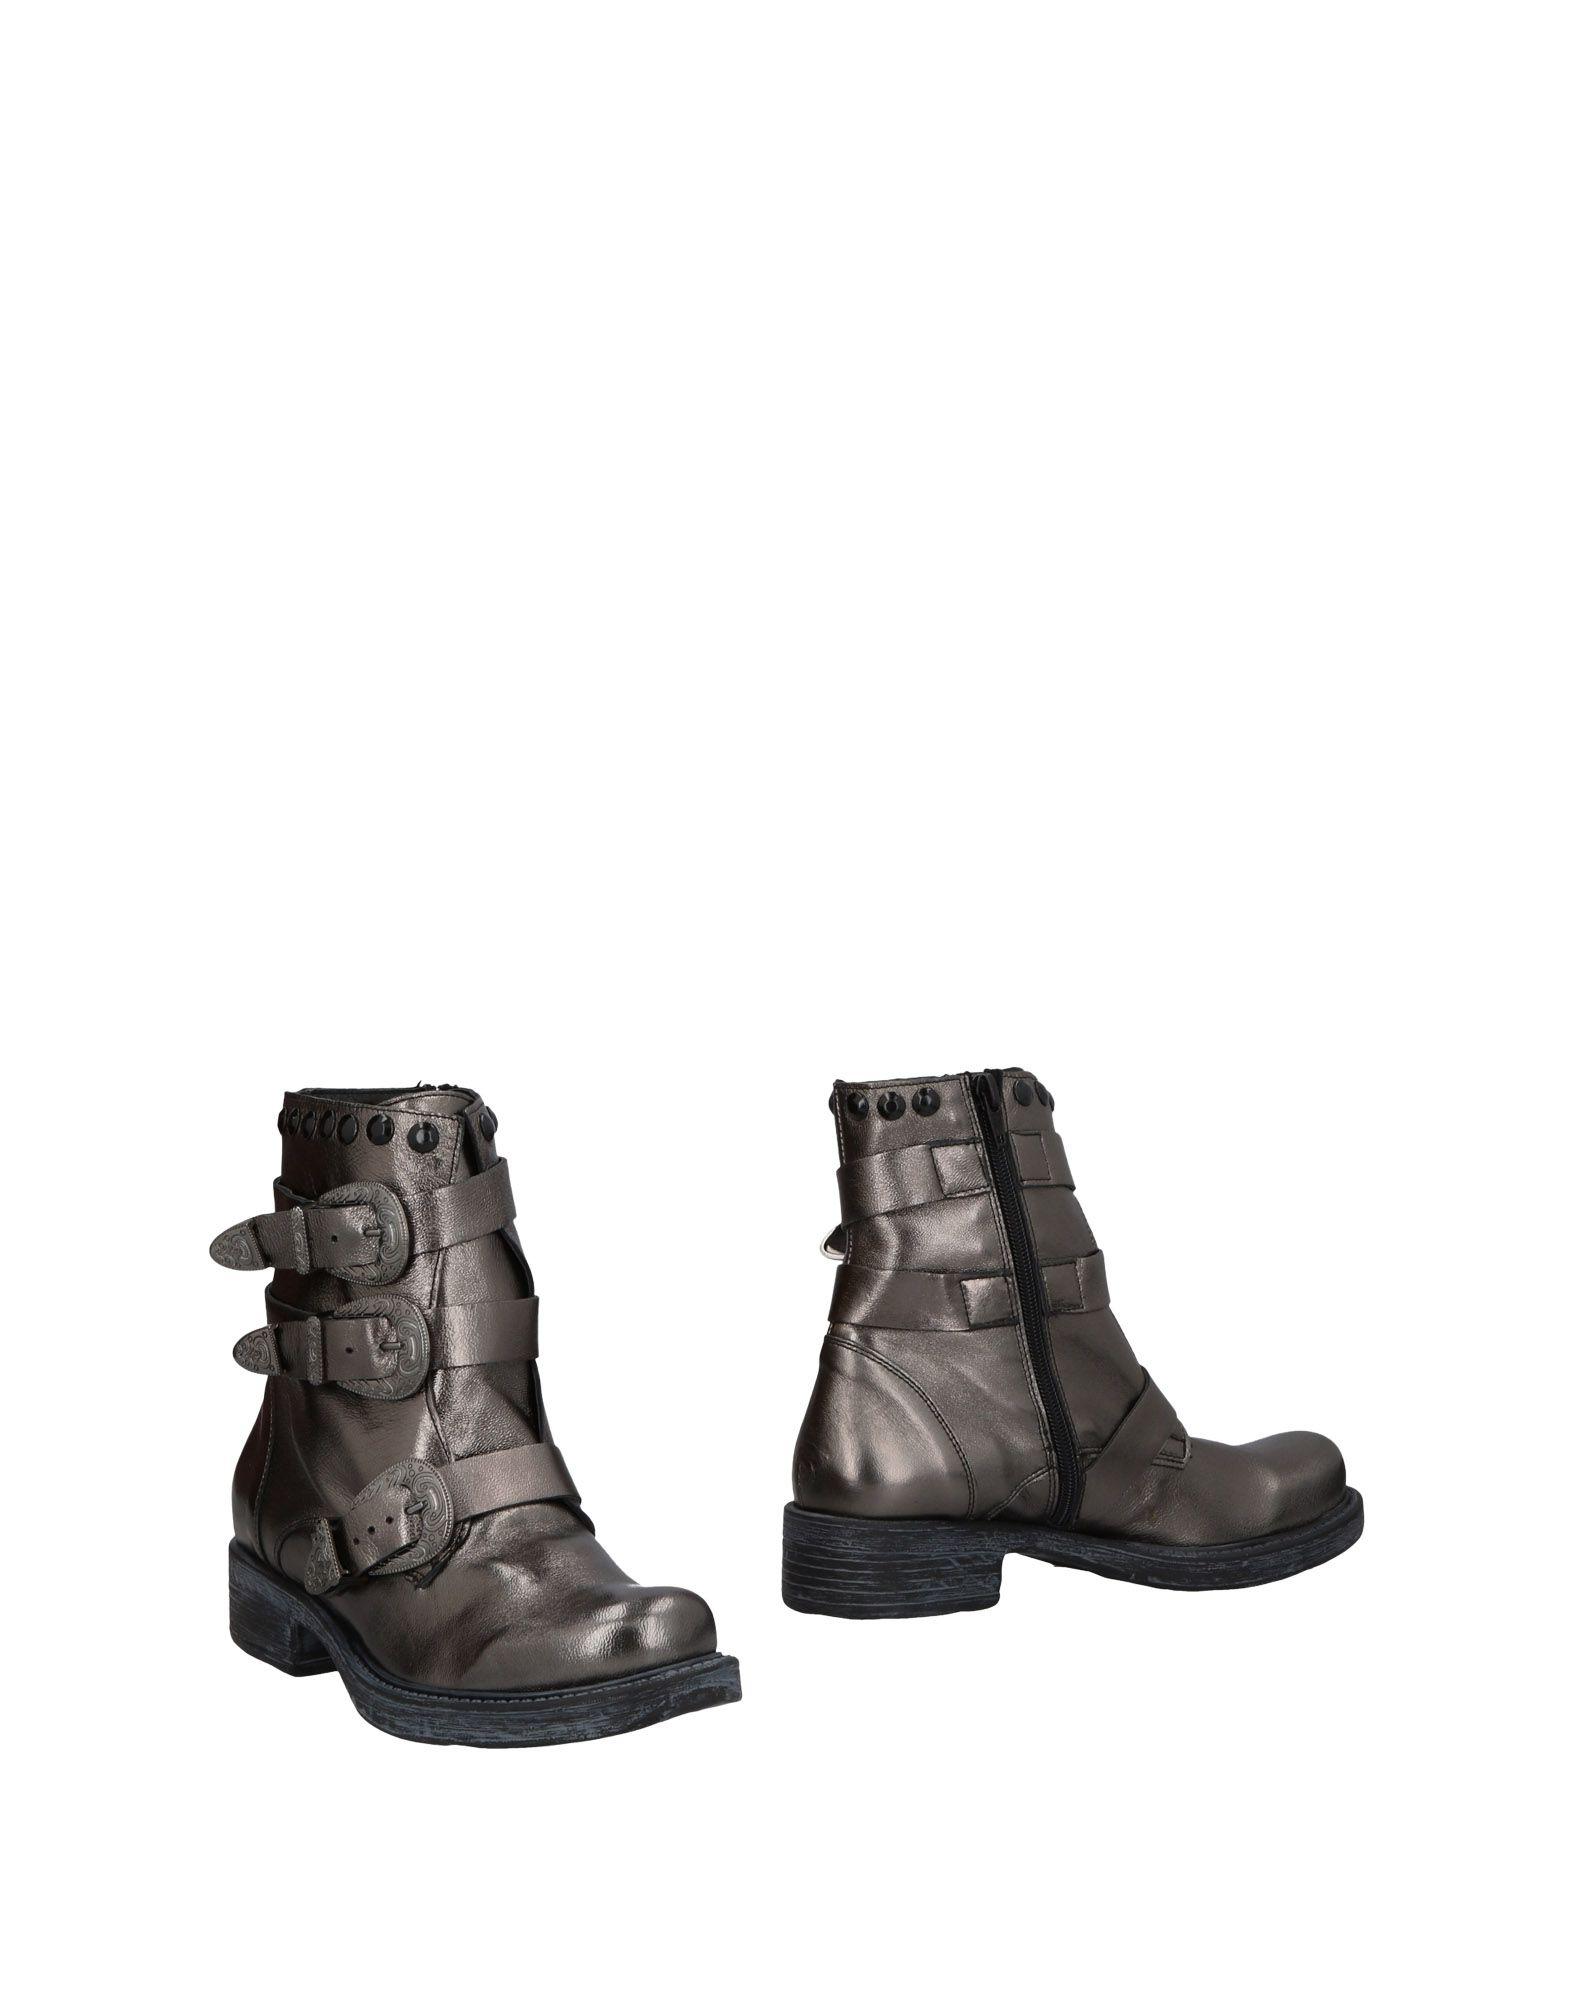 Nila & Nila Stiefelette Damen  Schuhe 11474226XW Gute Qualität beliebte Schuhe  c1bf64